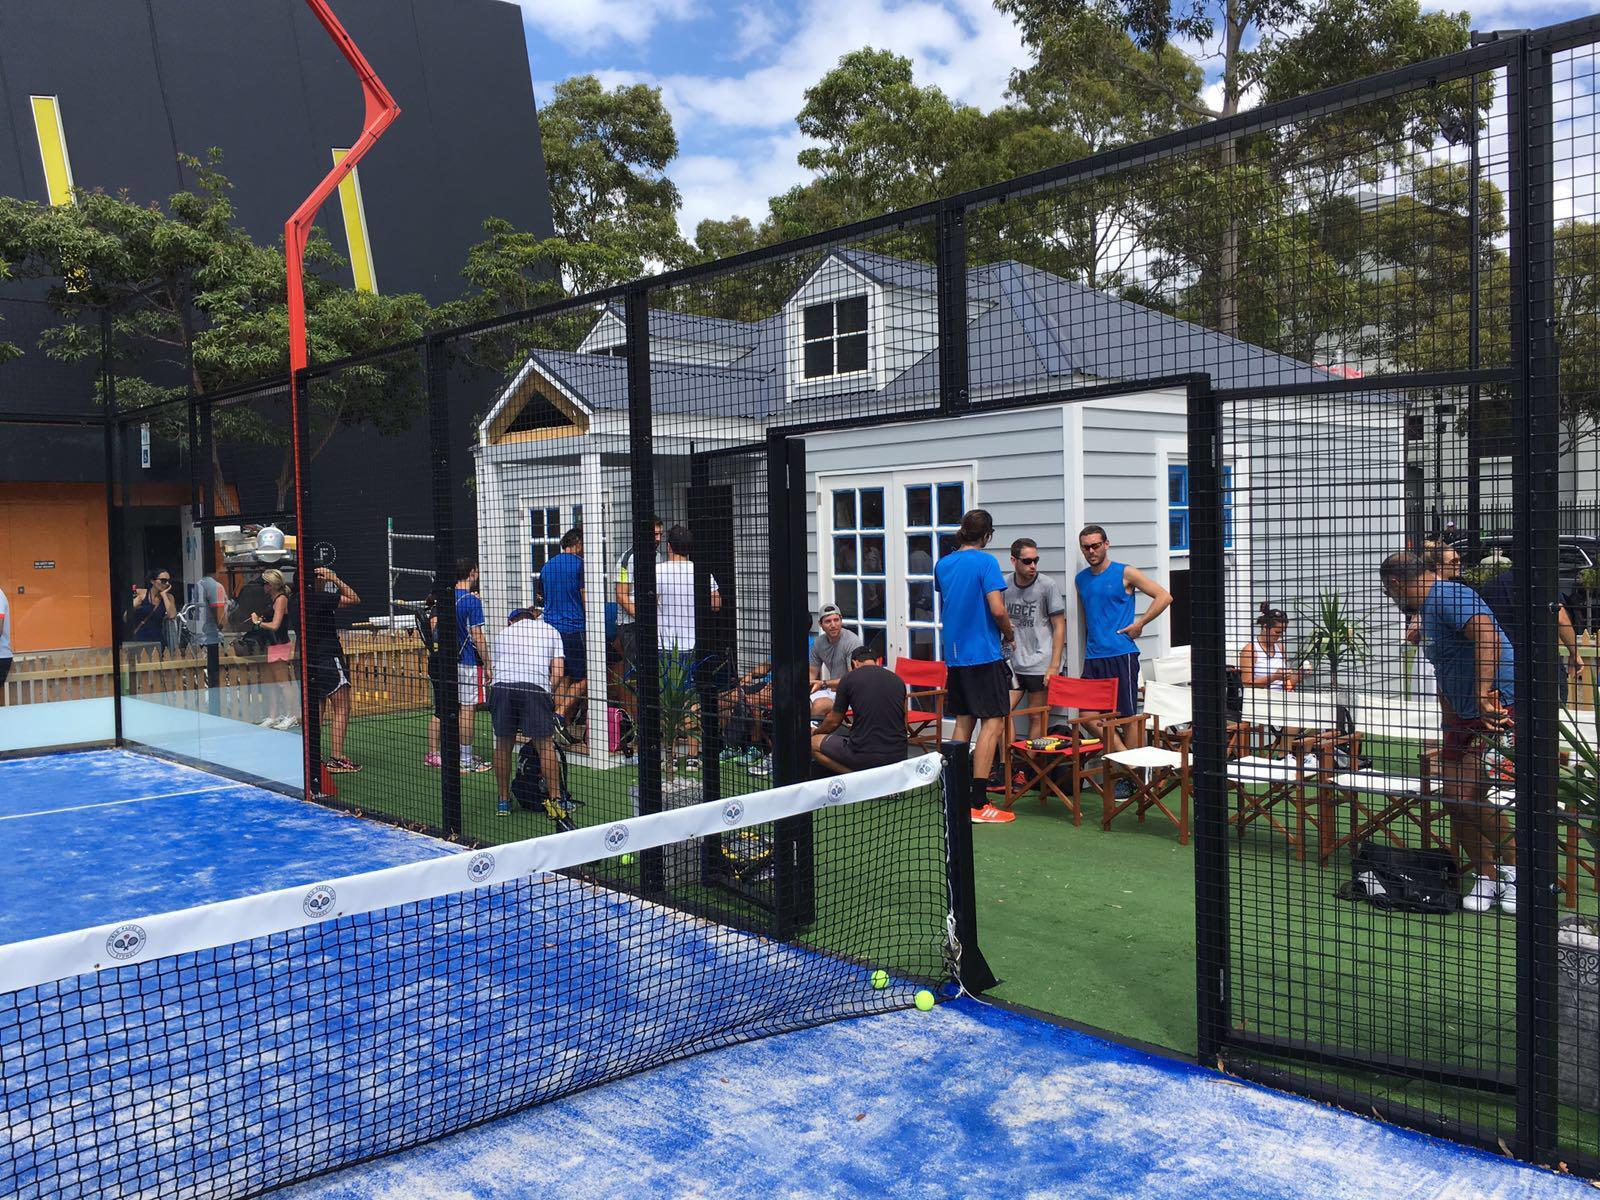 Padel Tennis business - fast growing sport